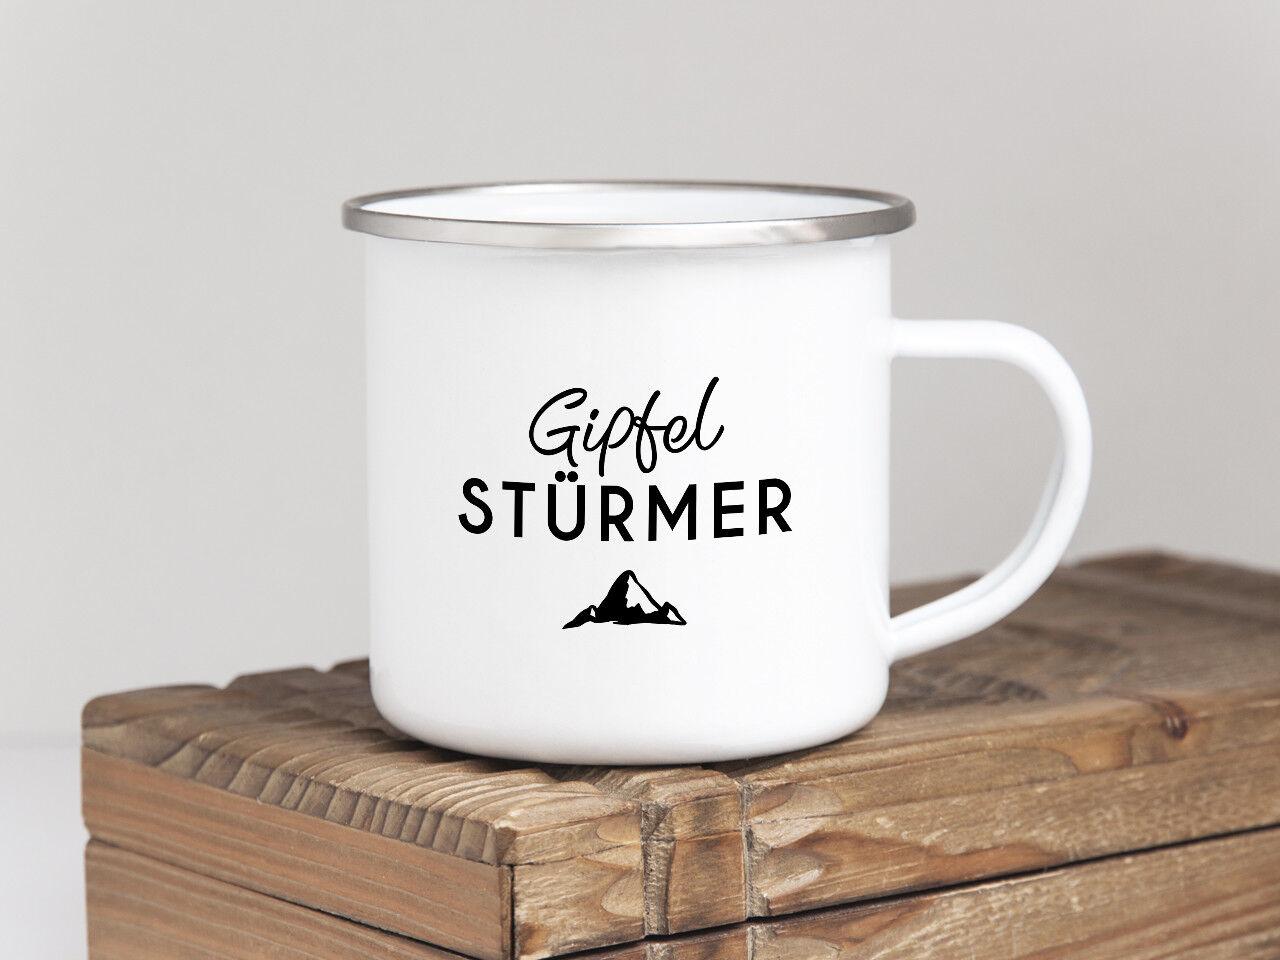 TASSE Kaffeebecher BESTER MAURER Geschenk Spruch Motiv Job Arbeit Hobby